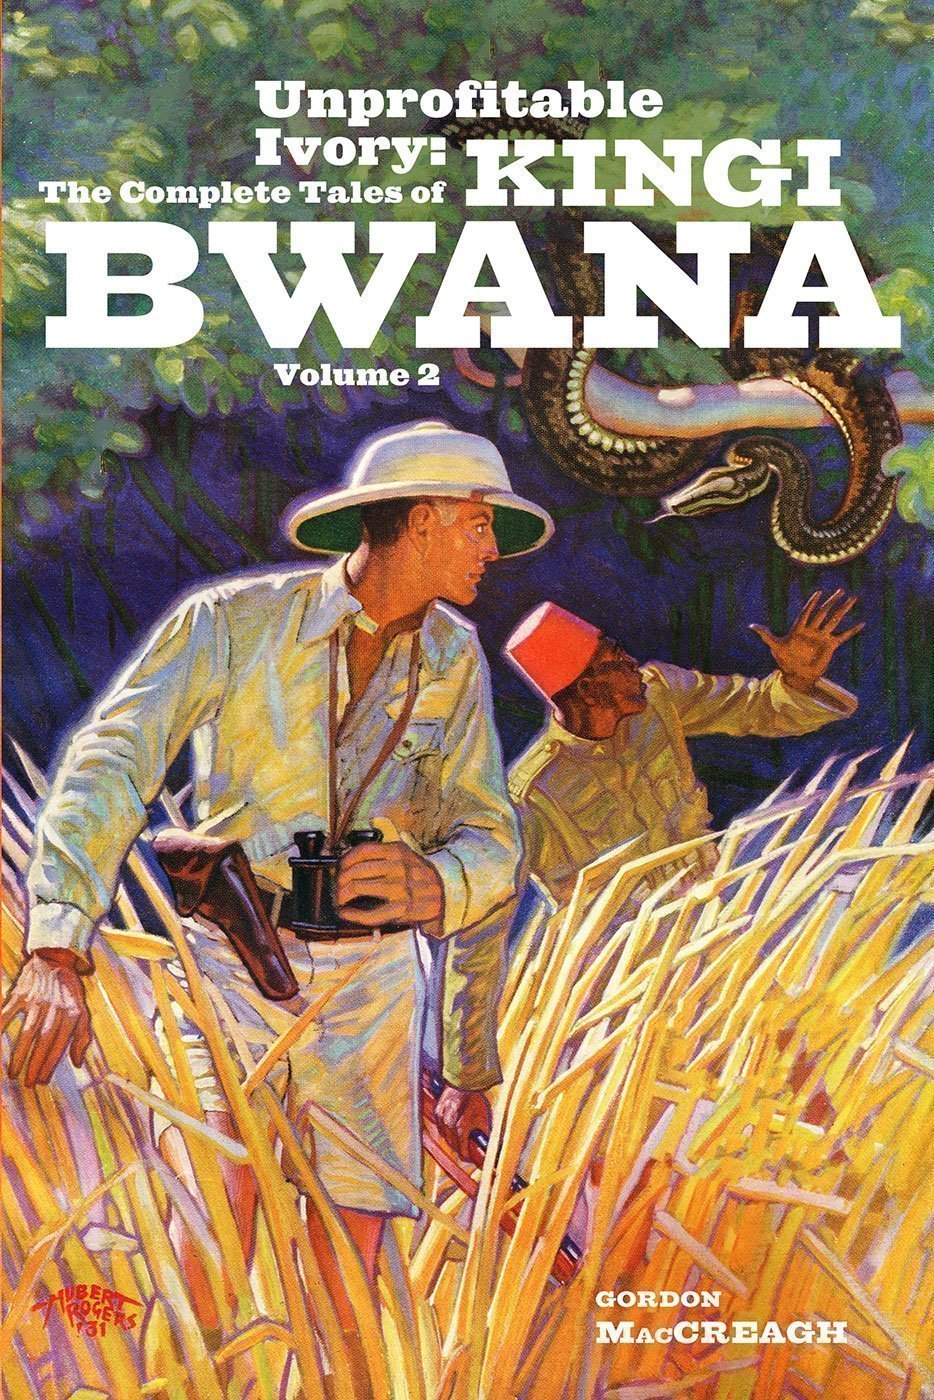 Unprofitable Ivory: The Complete Tales of Kingi Bwana, Volume 2